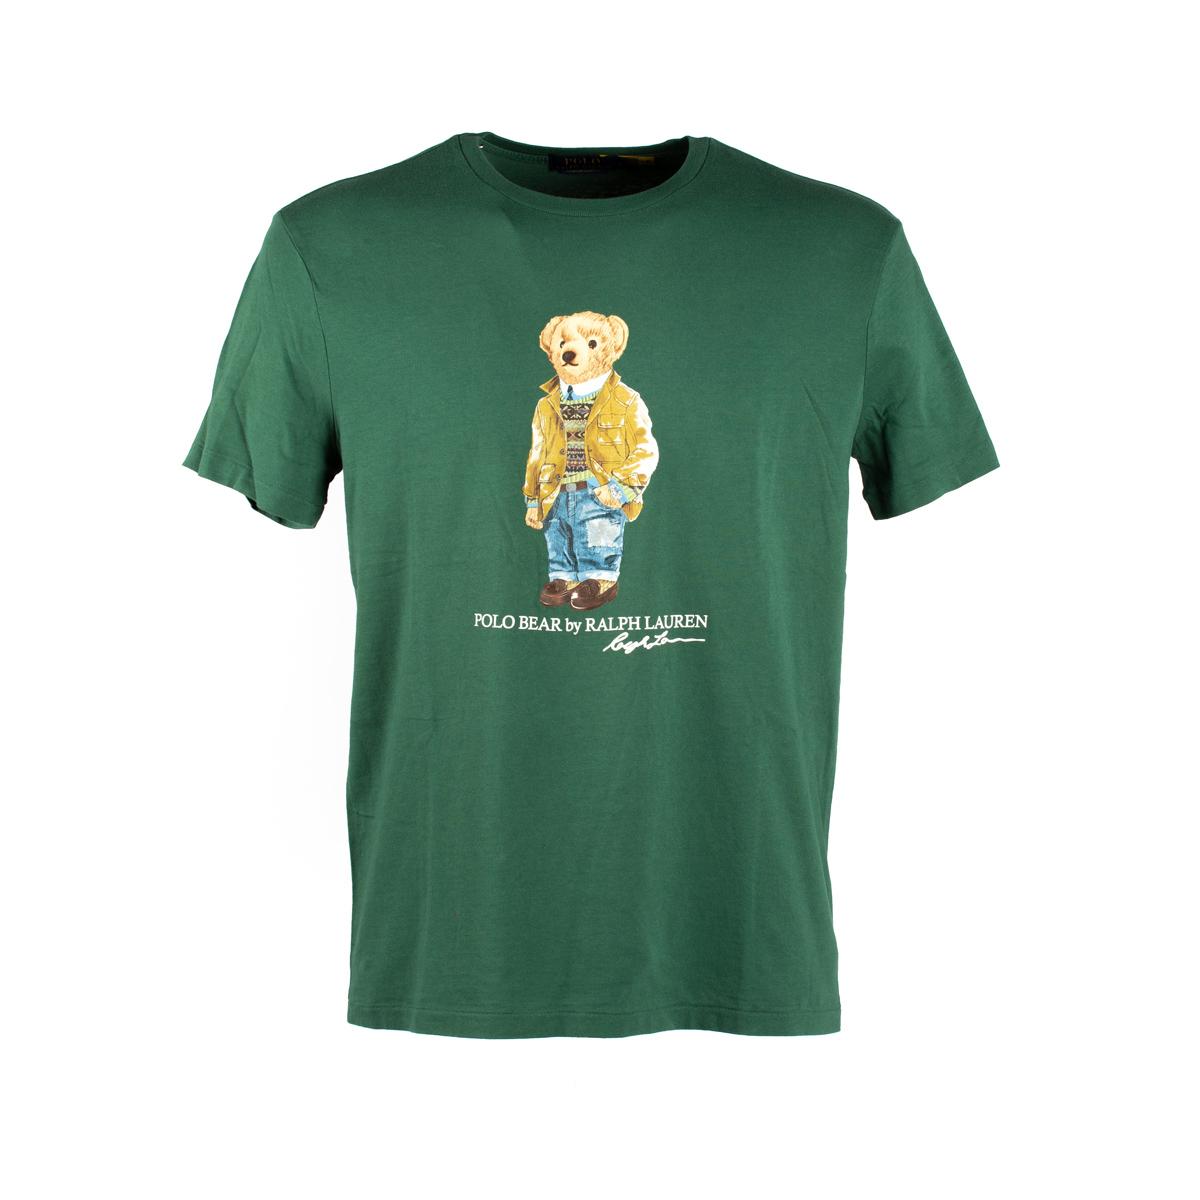 T-Shirt Polo Ralph Lauren Verde stampa orsetto